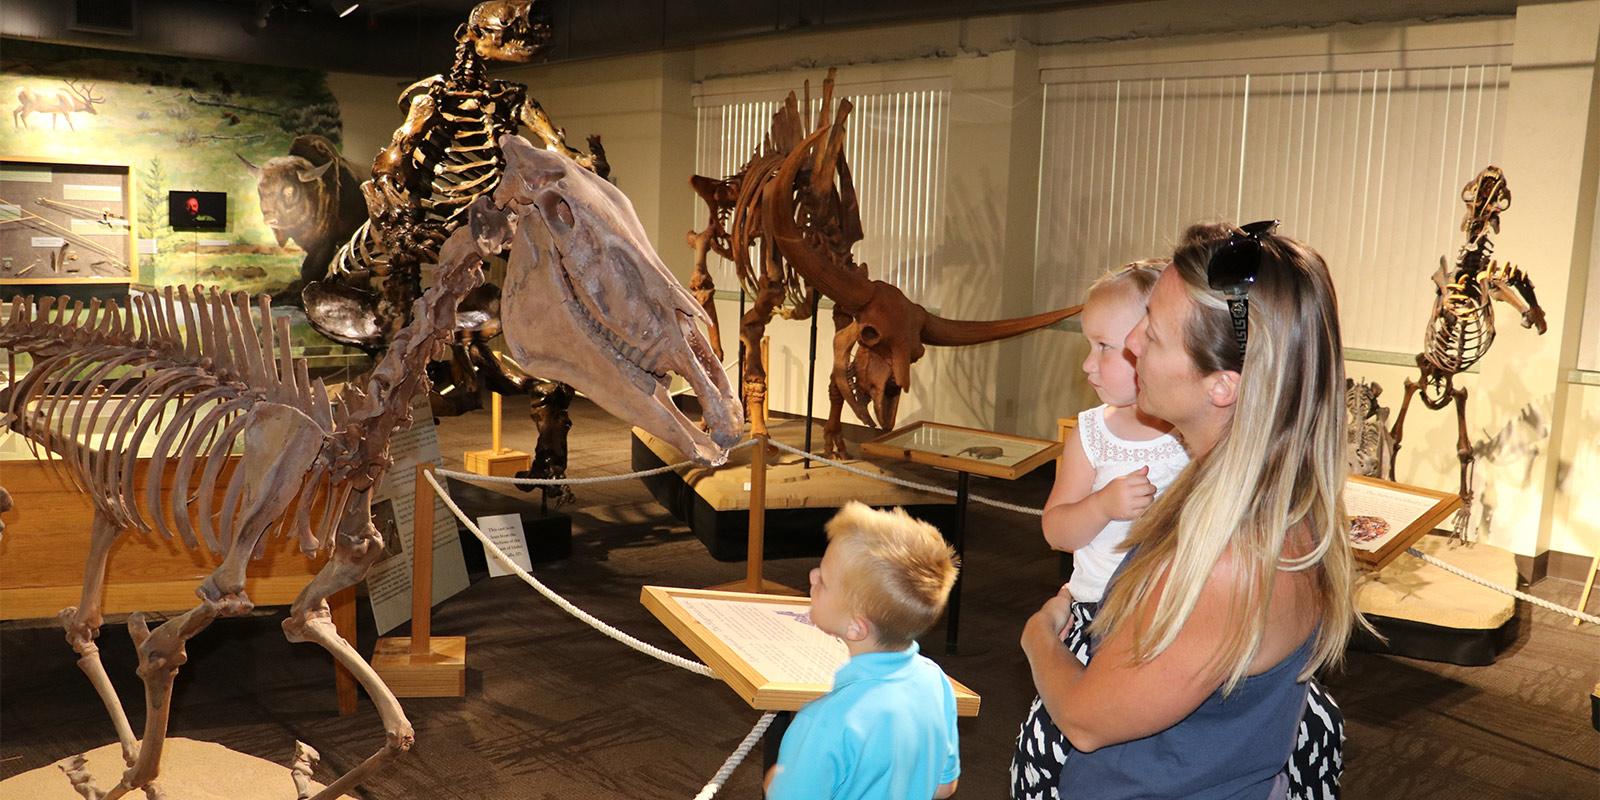 image: family looking at dinosuar bones